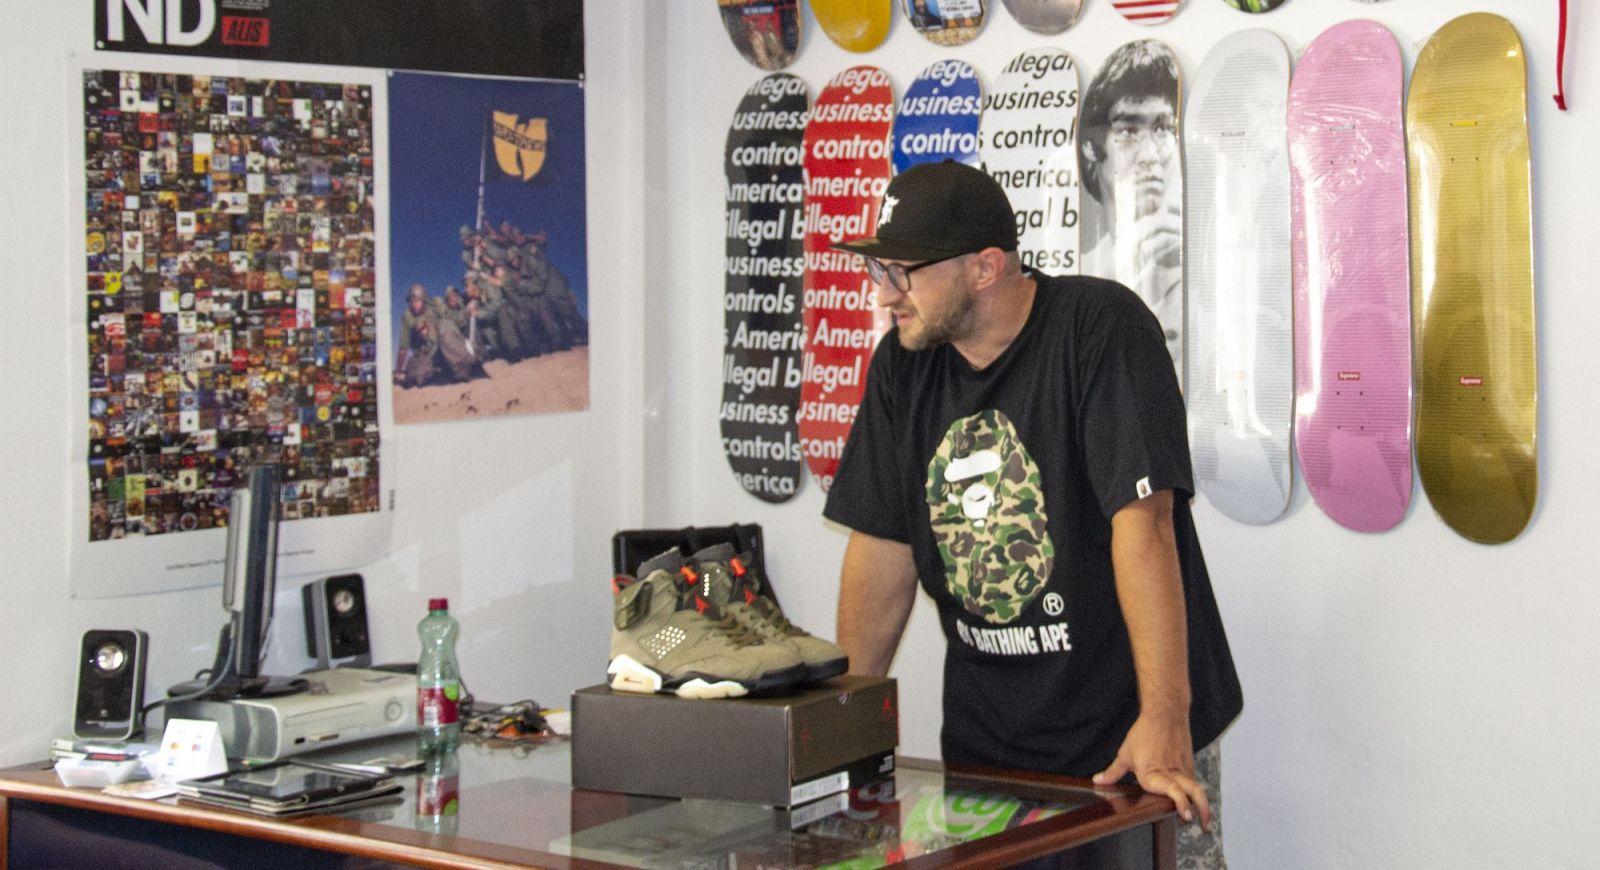 Supreme nosil už v roku 1997 a dnes vlastní prvý resell obchod v Rakúsku (Rozhovor)